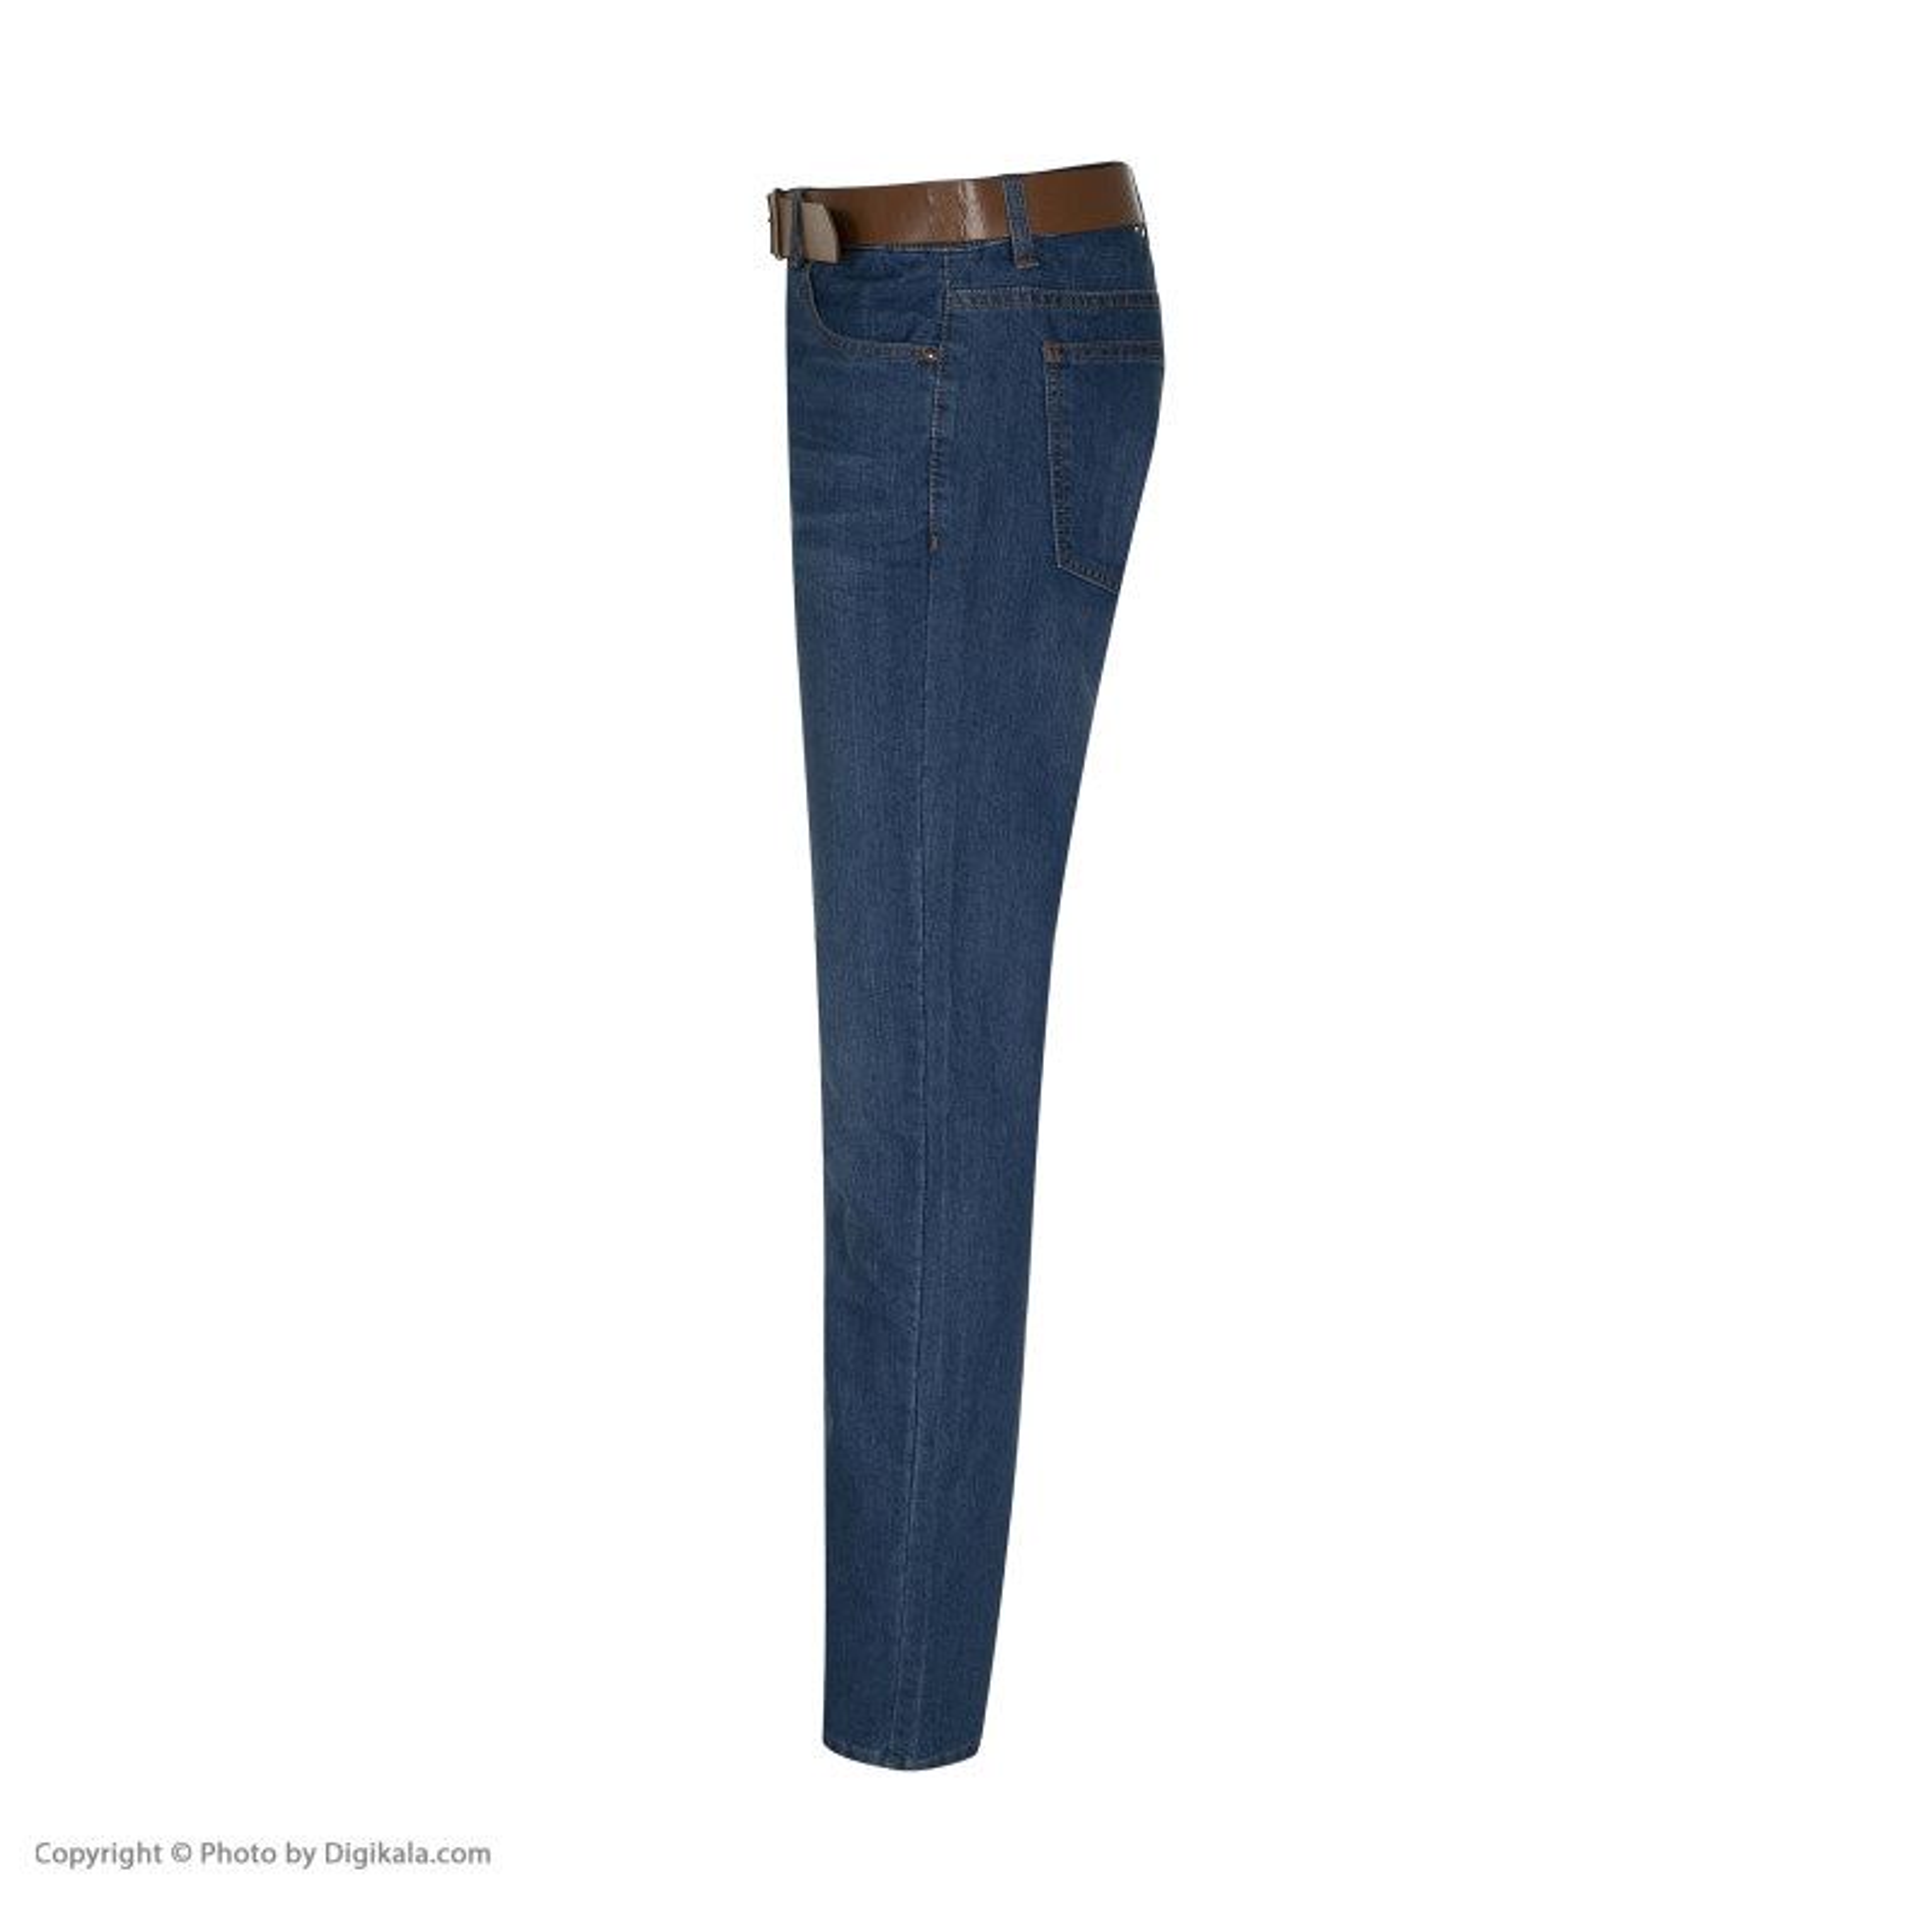 شلوار جین مردانه کوتون مدل 7KAM43010LD-740